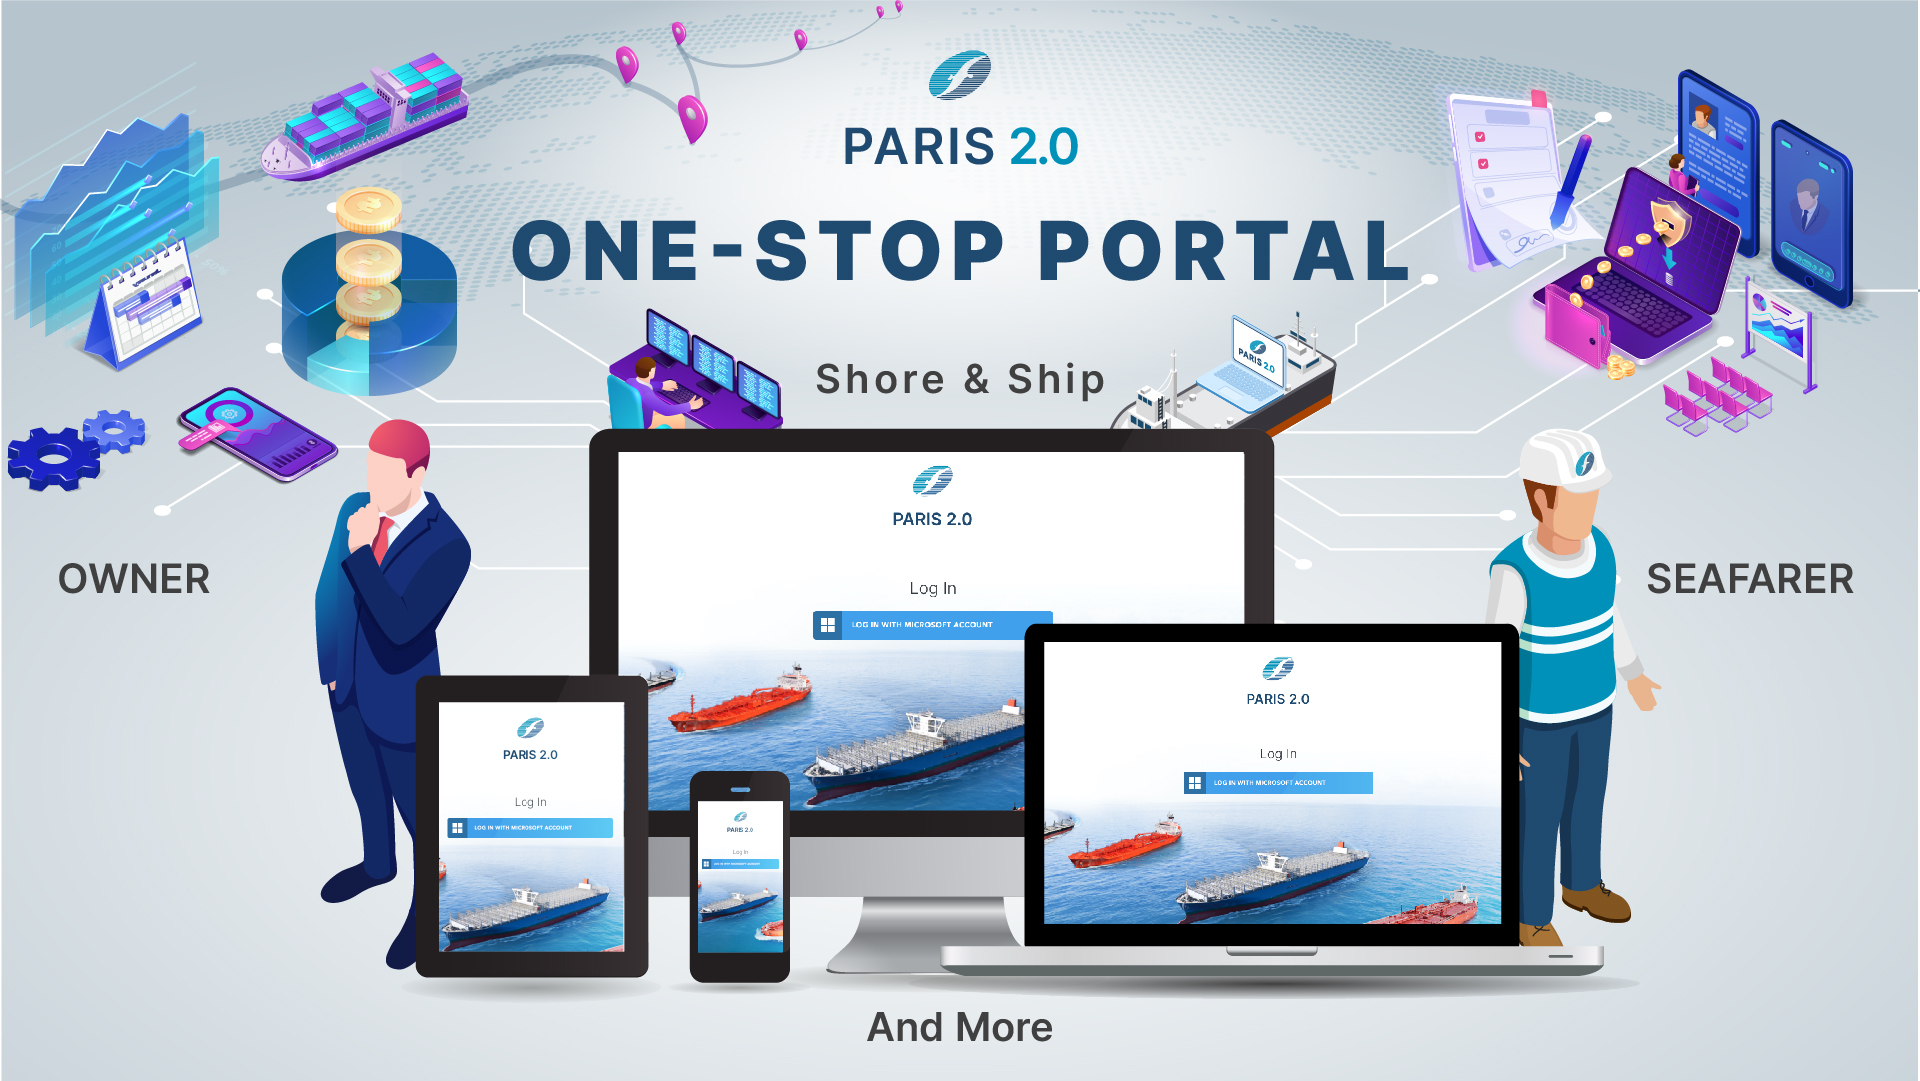 Digital Transformation: Taking PARIS to the next level